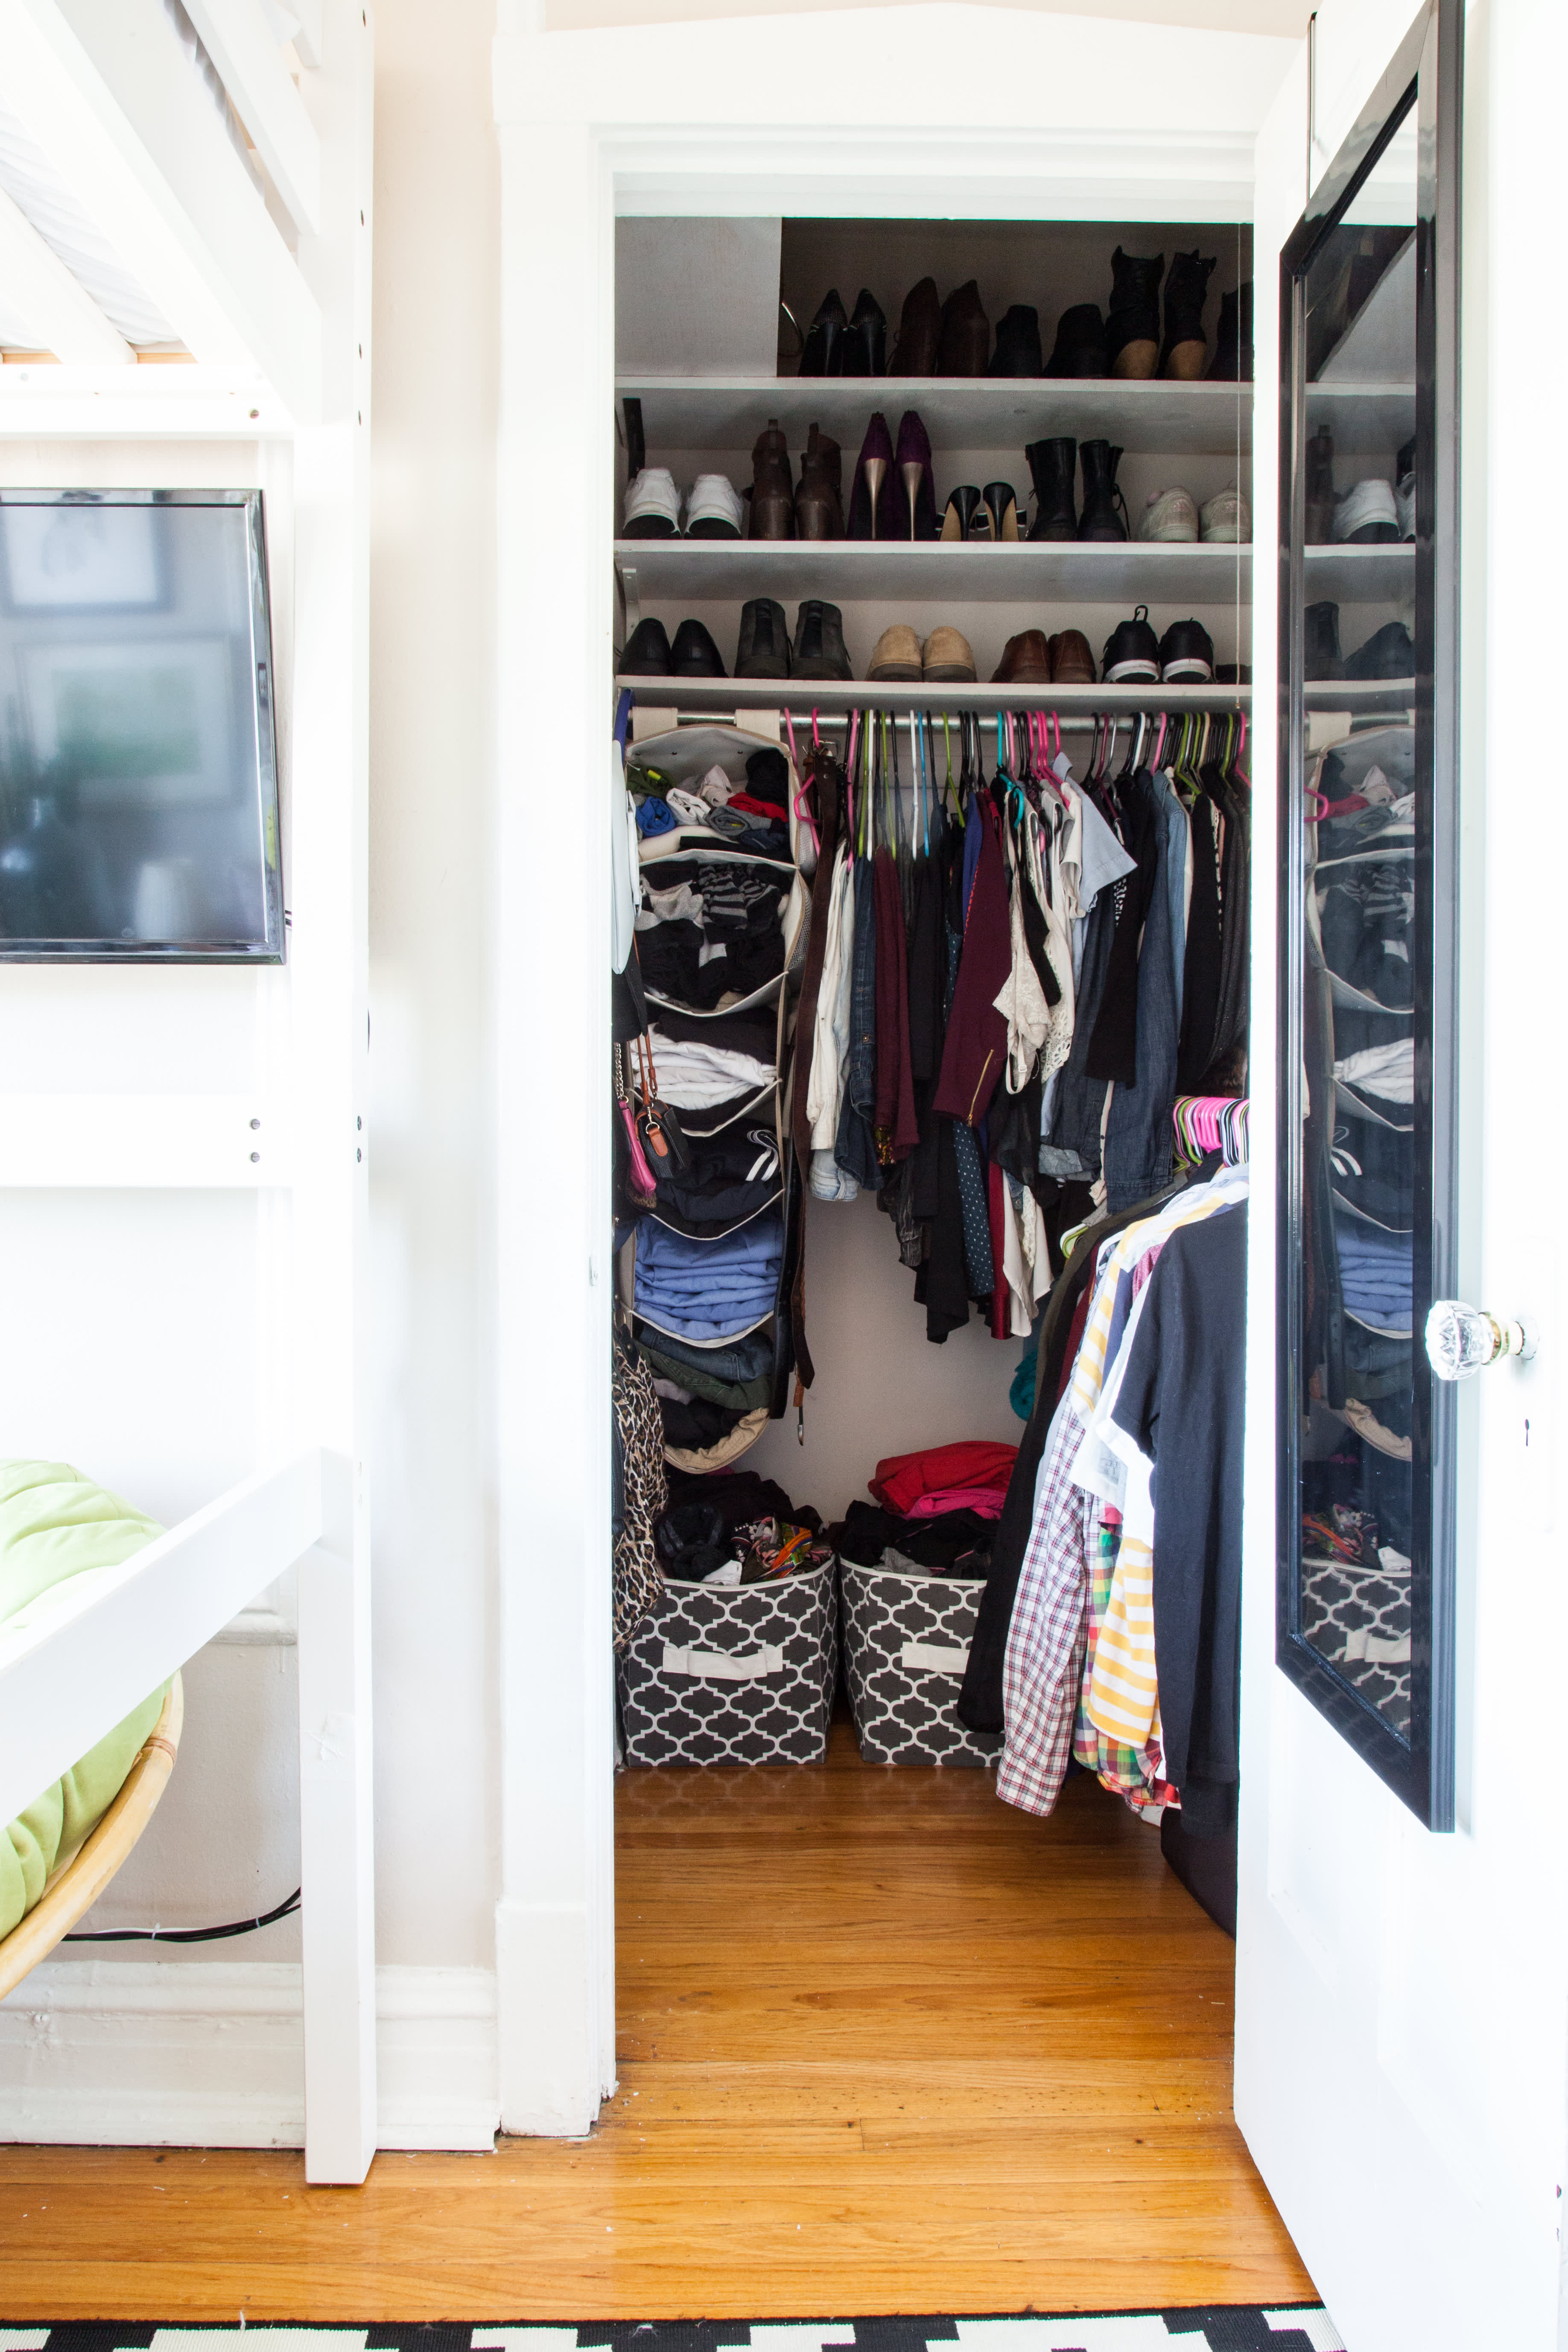 Closet Storage Ideas - Small Closet Organization ... on Small Apartment Organization  id=94374